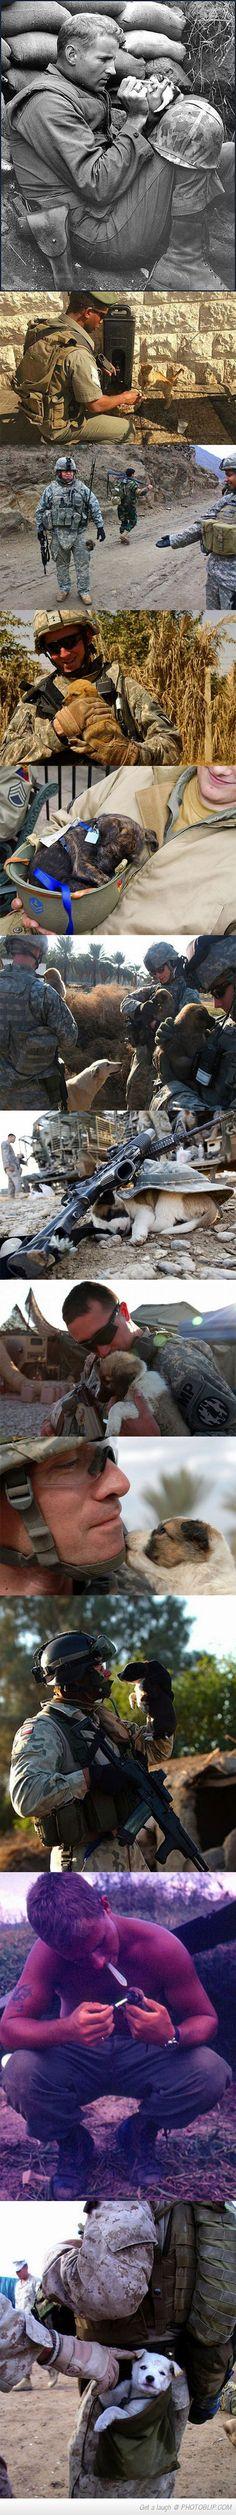 A Soldier's Best Friend